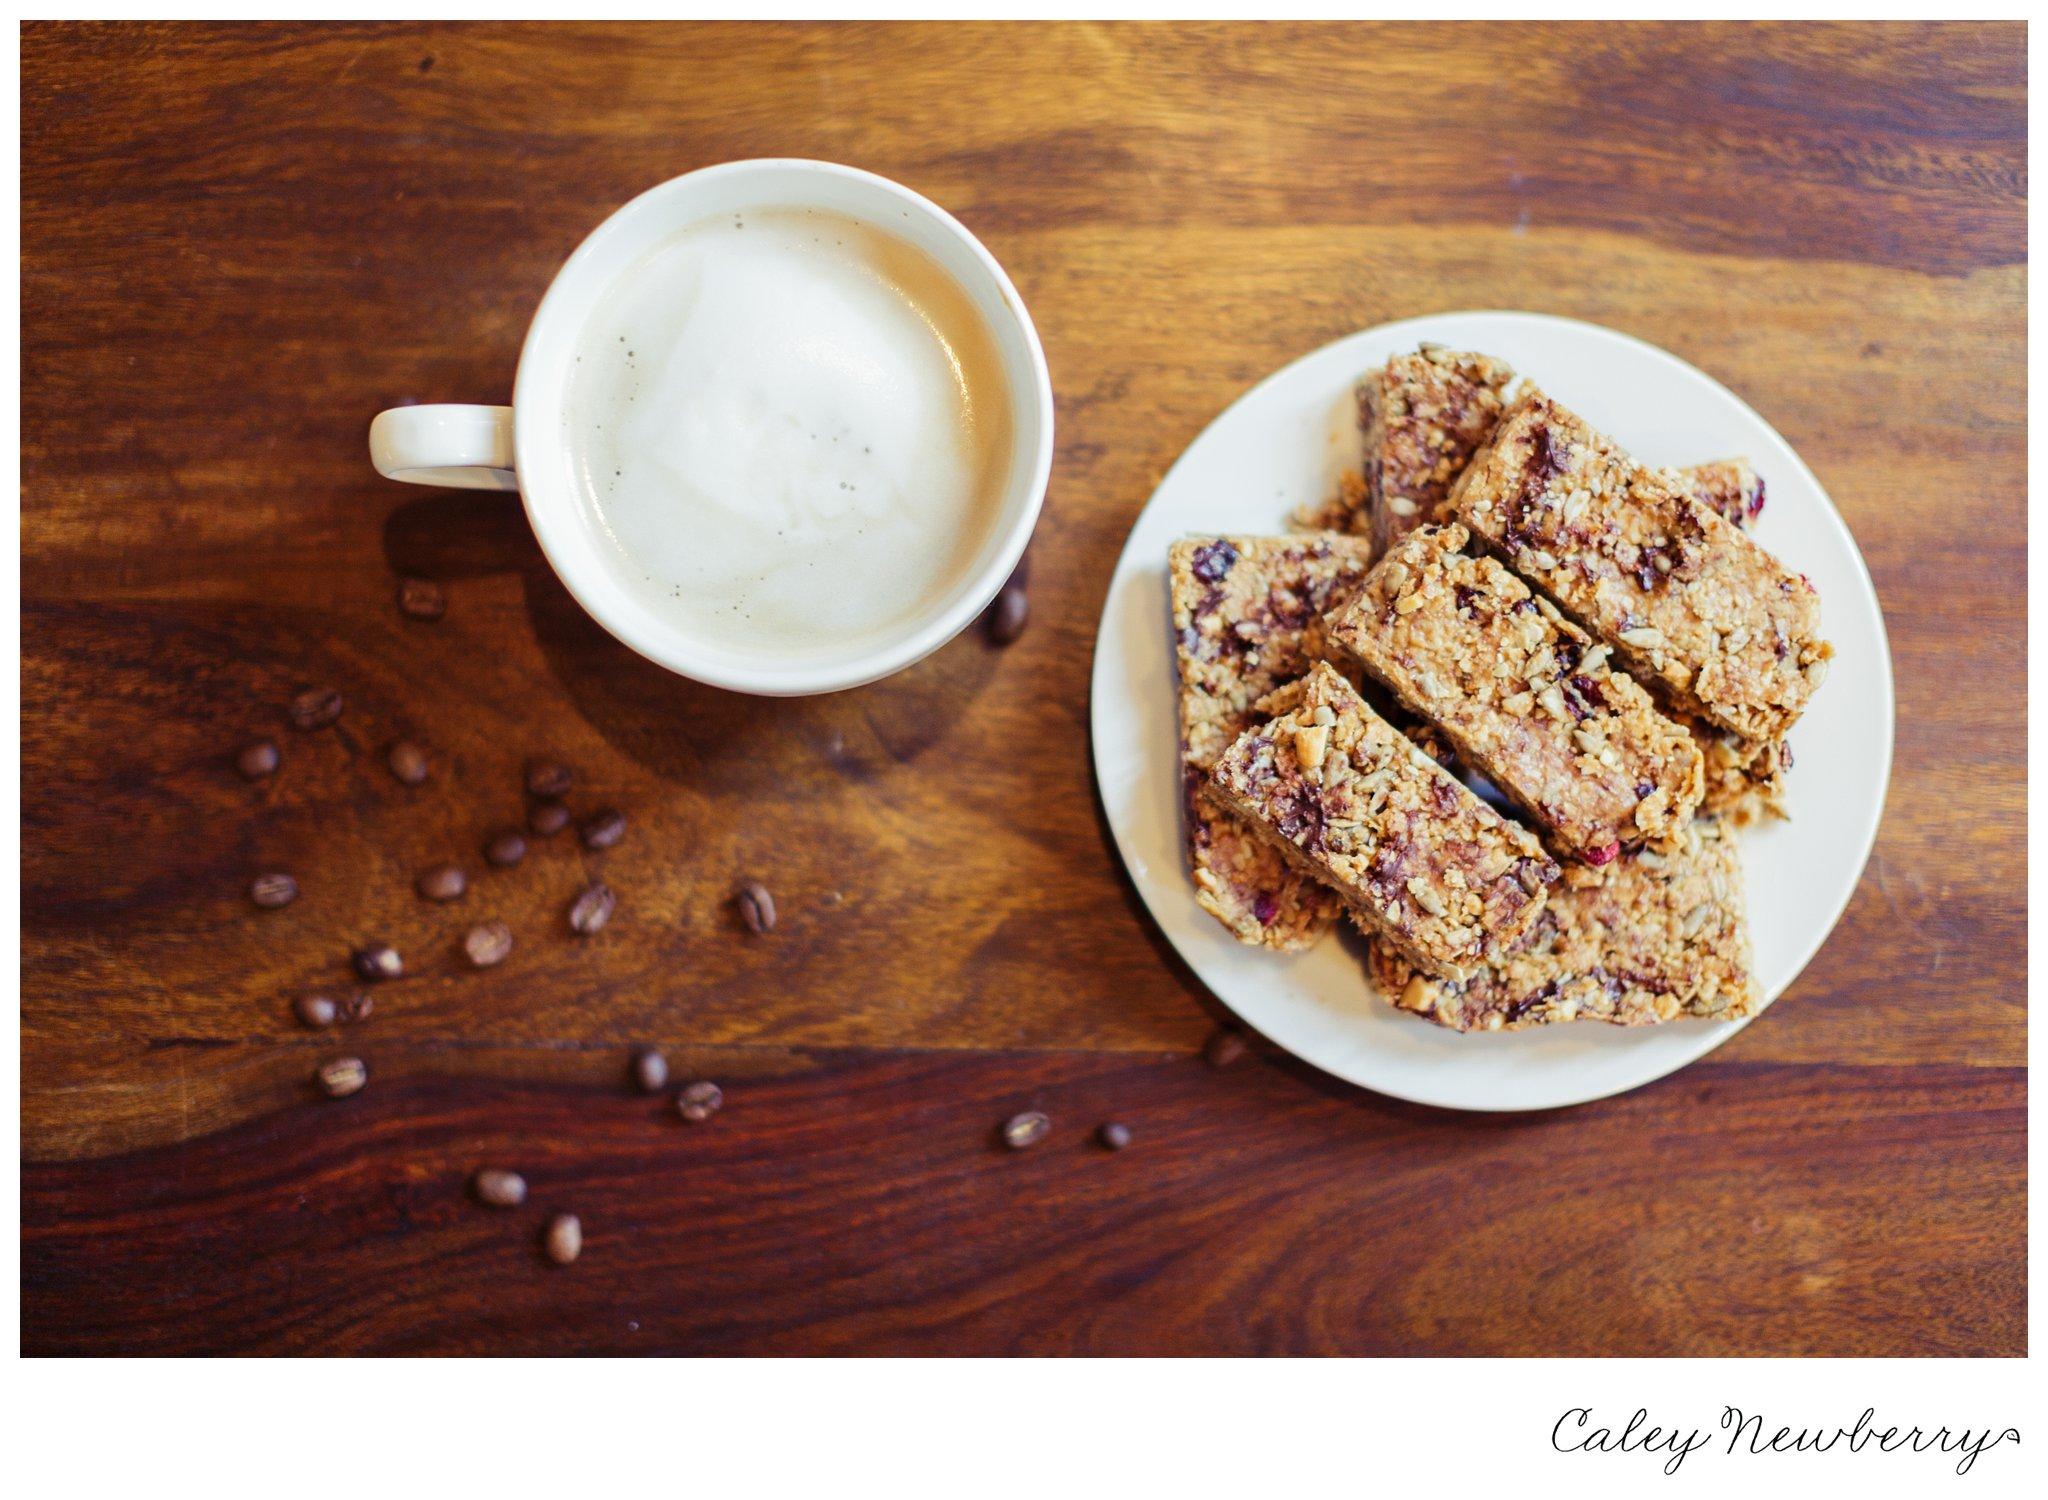 gluten free breakfast bars, protein bar recipe, peanut butter bar recipe, gluten free breakfast bar recipe, peanut butter breakfast bar, diy breakfast bars, make breakfast bars at home